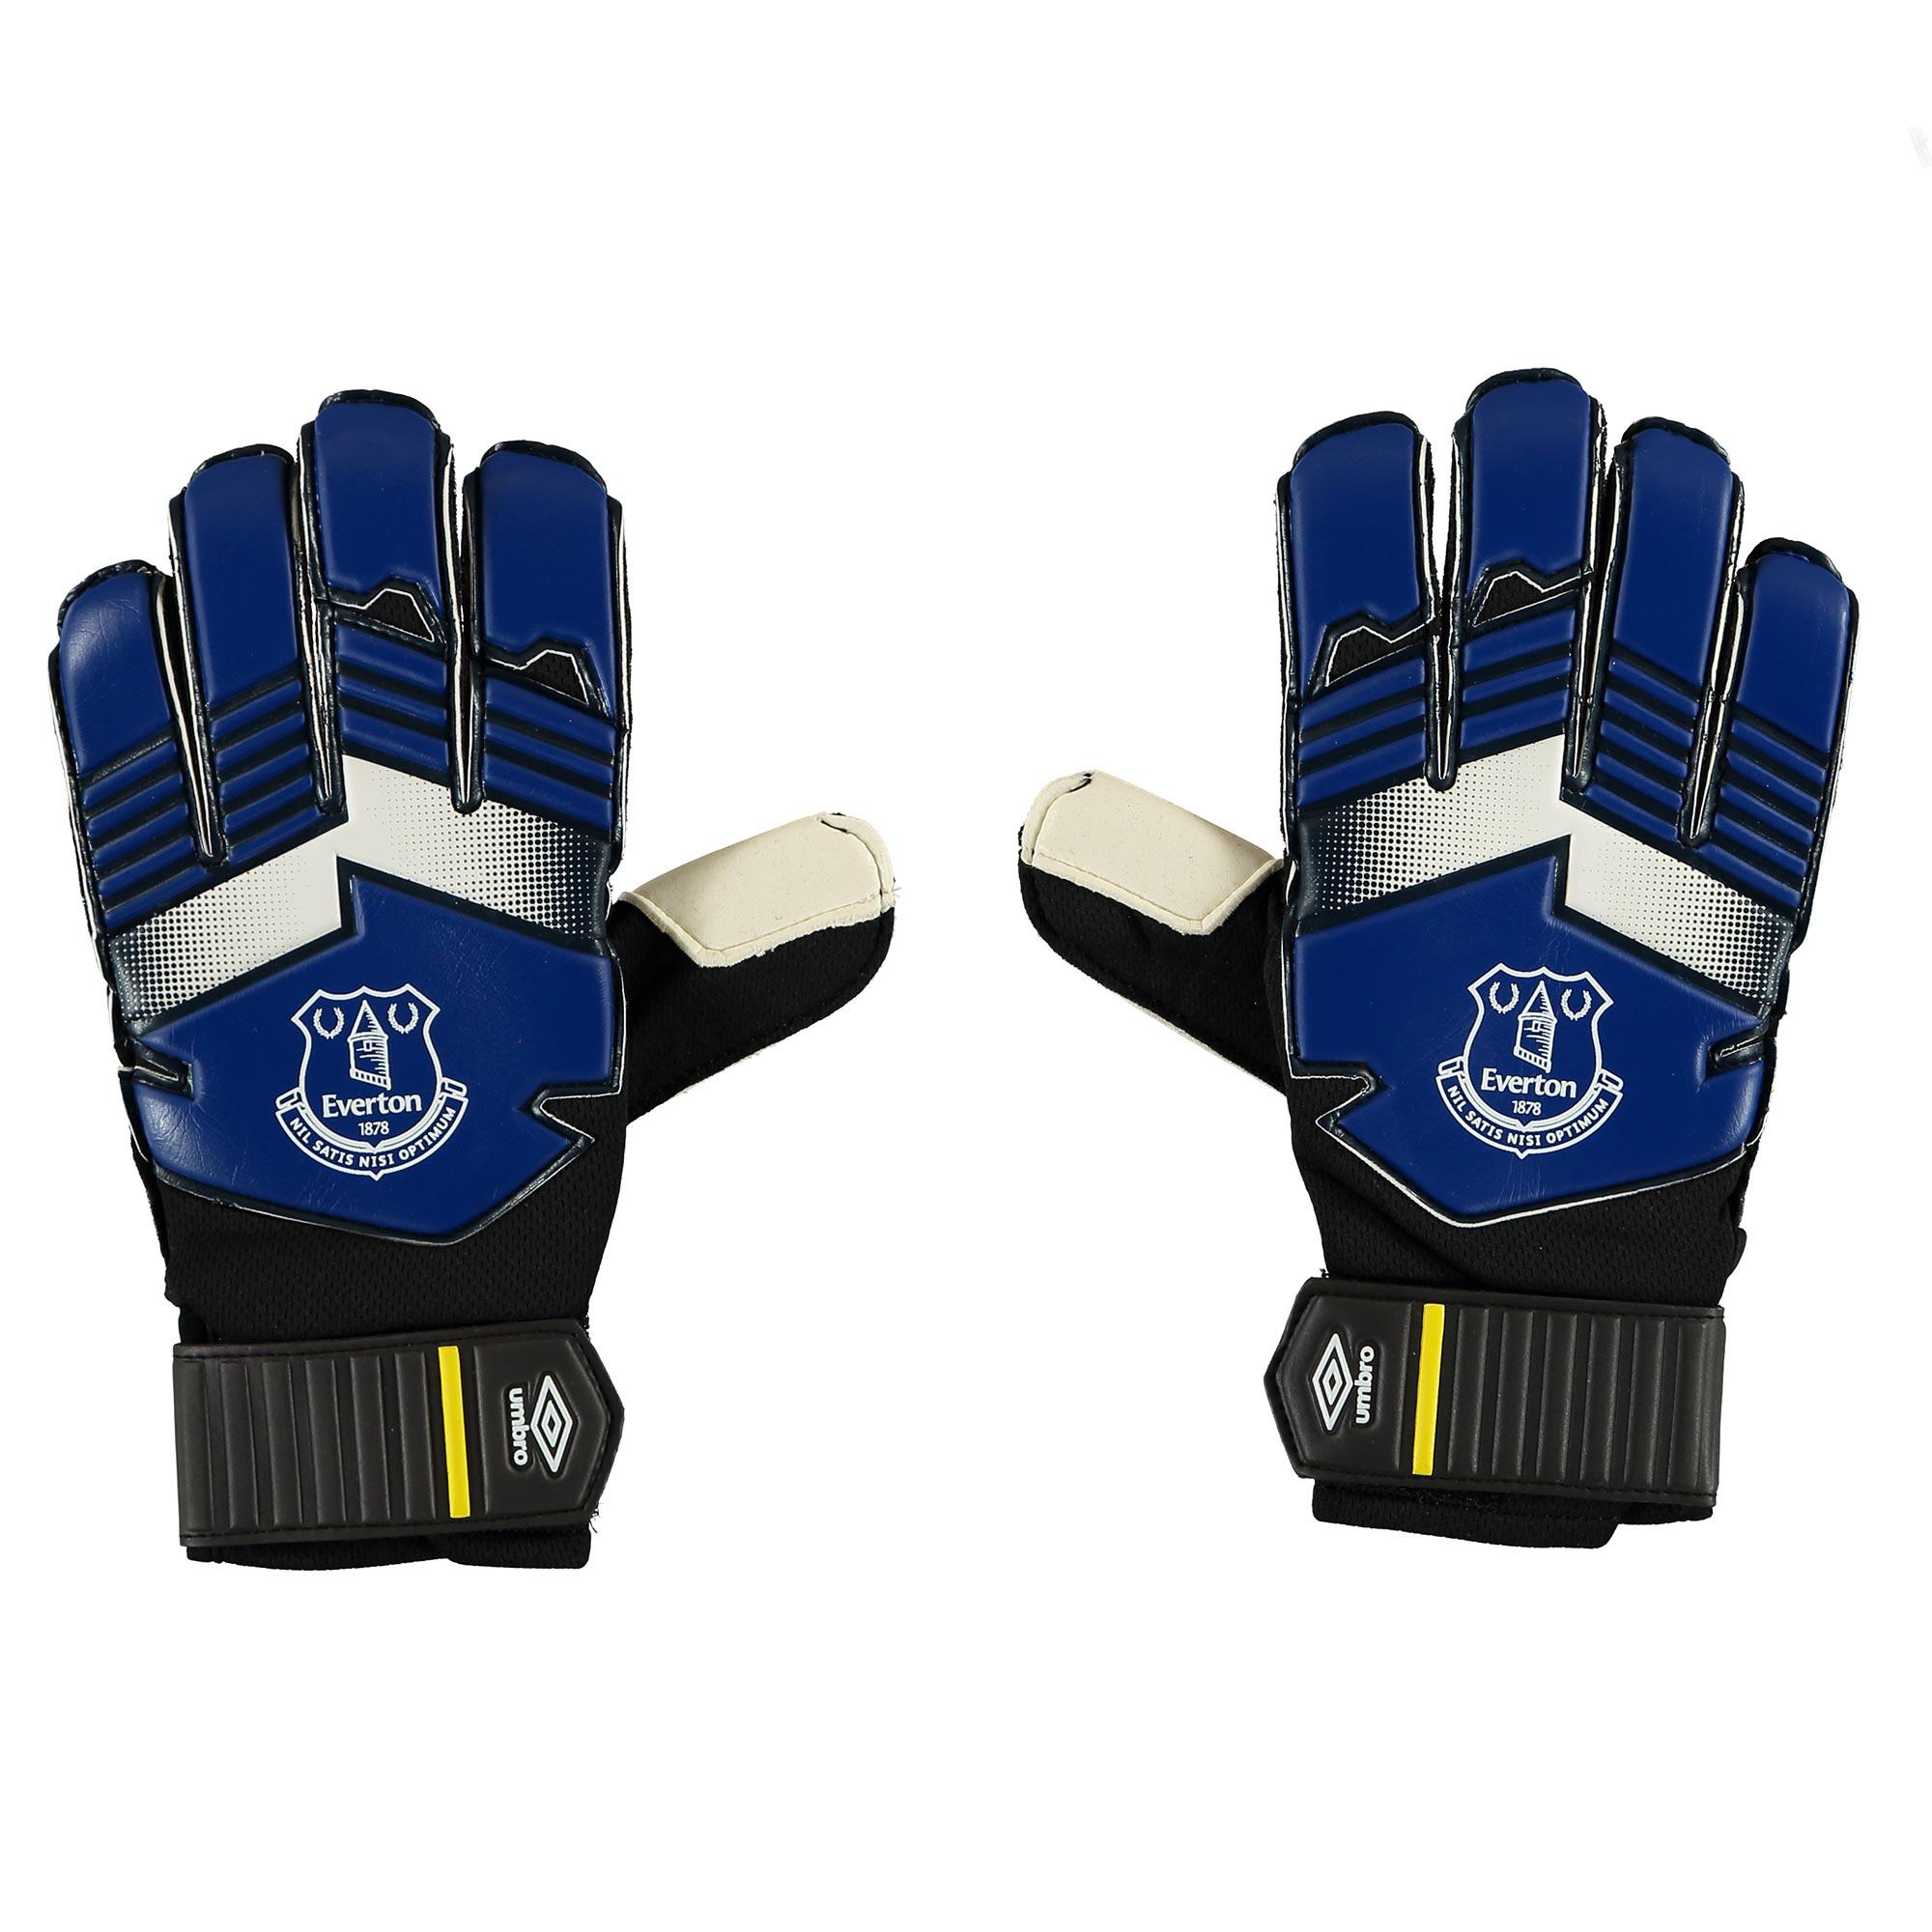 Everton Neo Club Glove - Junior - Deep Surf/White/Black/Yellow